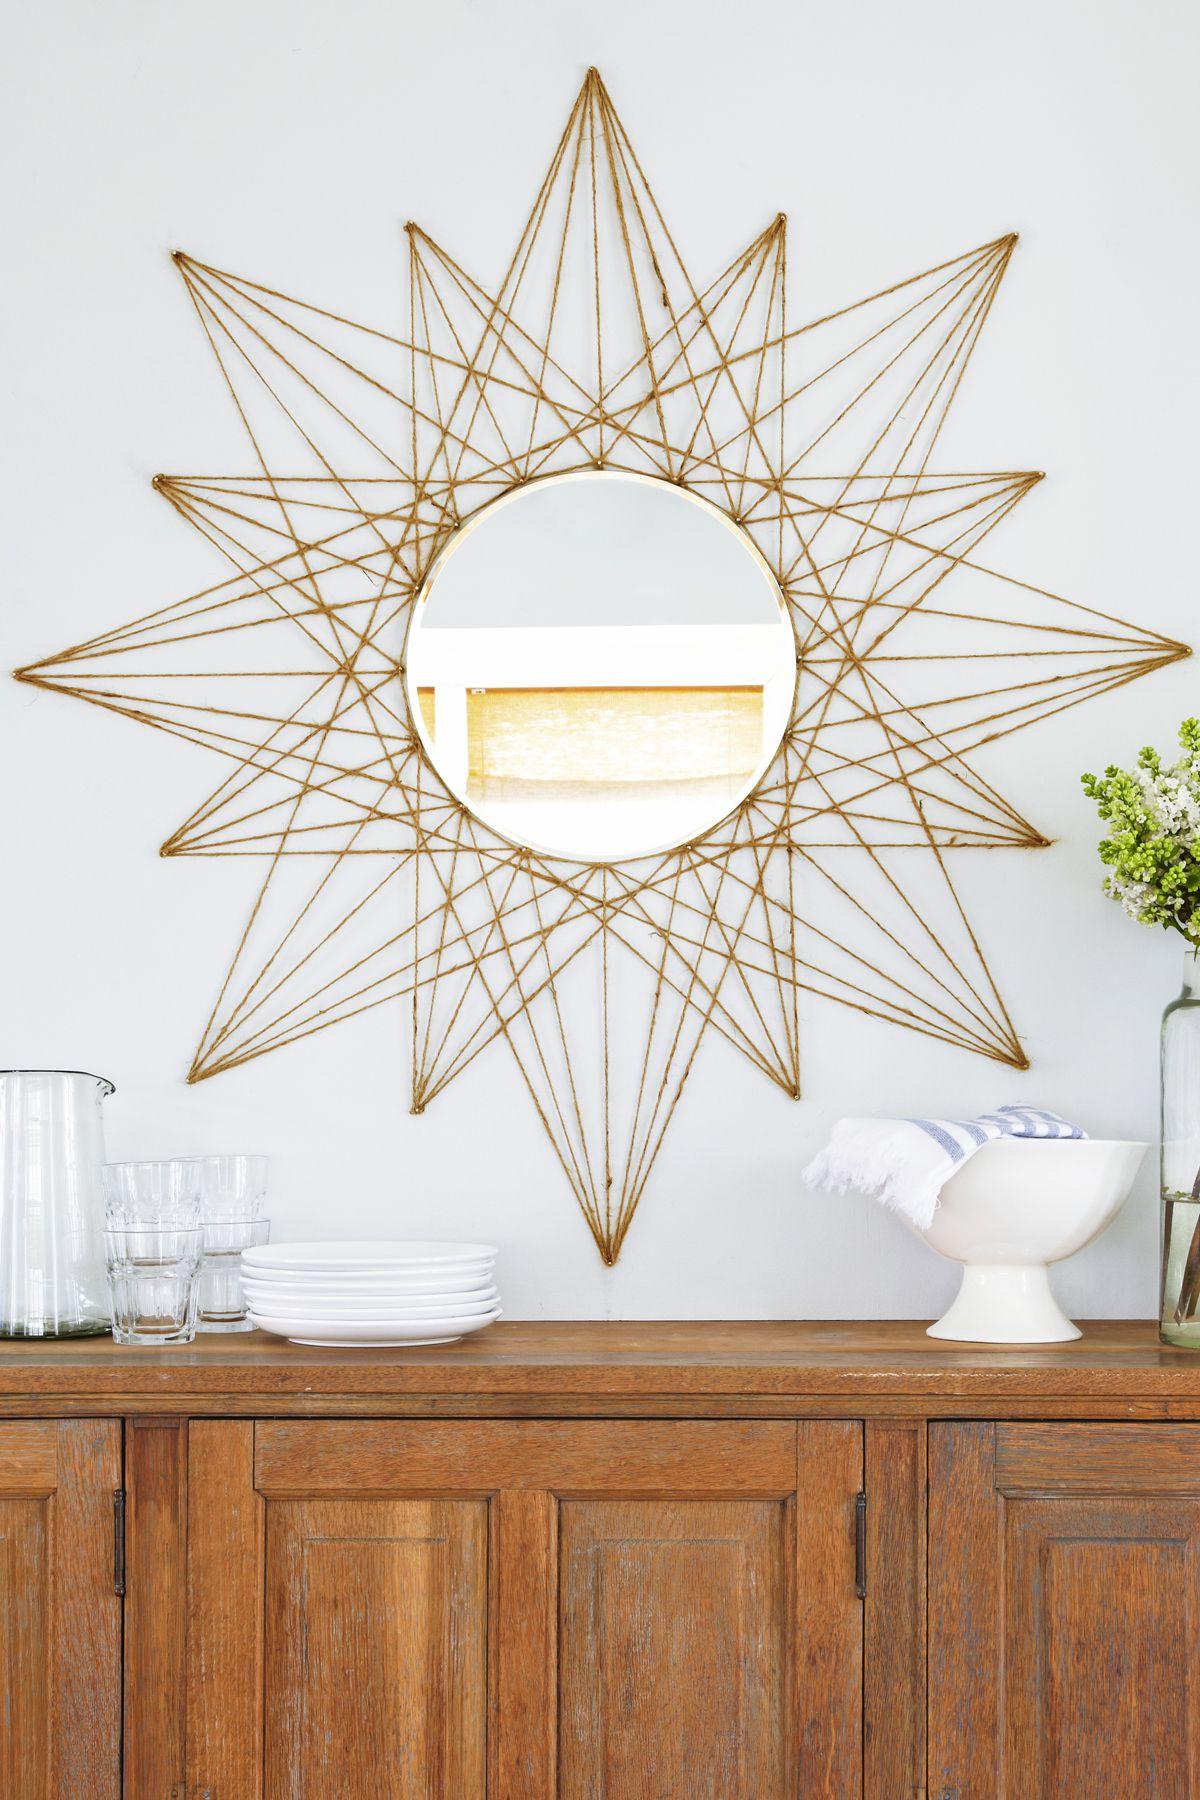 25 DIY Home Decor Ideas - Cheap Home Decorating Crafts